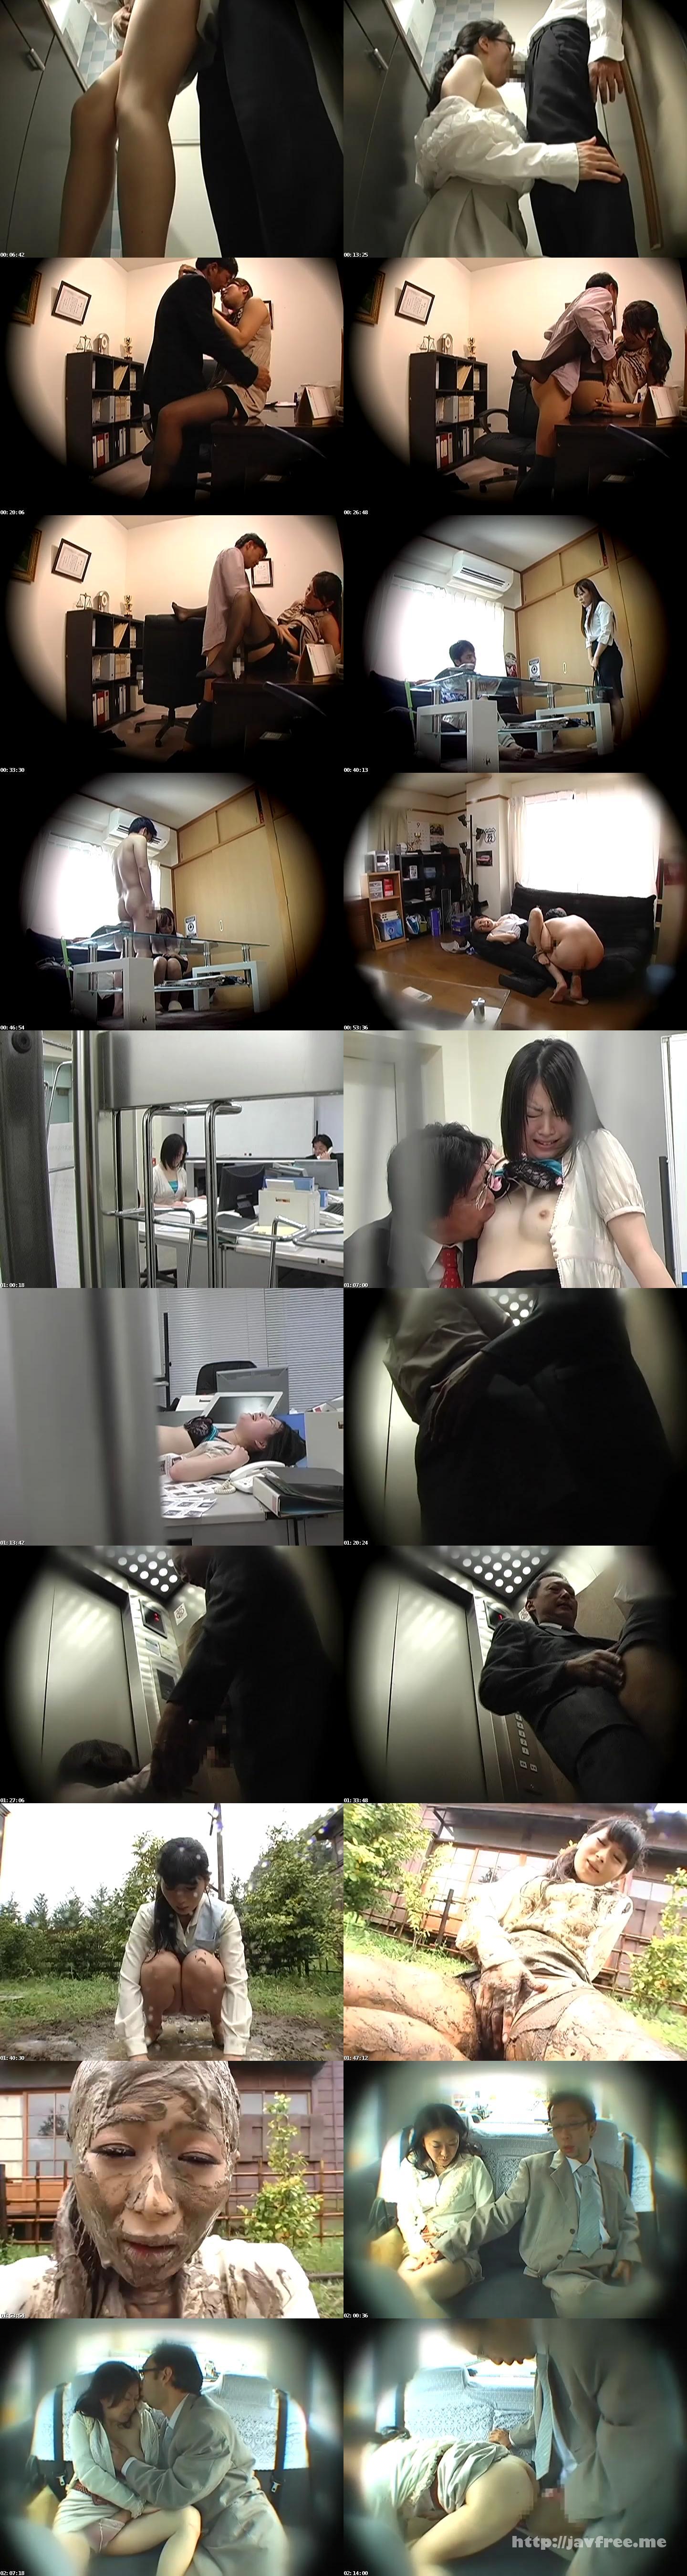 [NEWS-143] 強制ワイセツ 汚す 犯す - image NEWS-143 on https://javfree.me